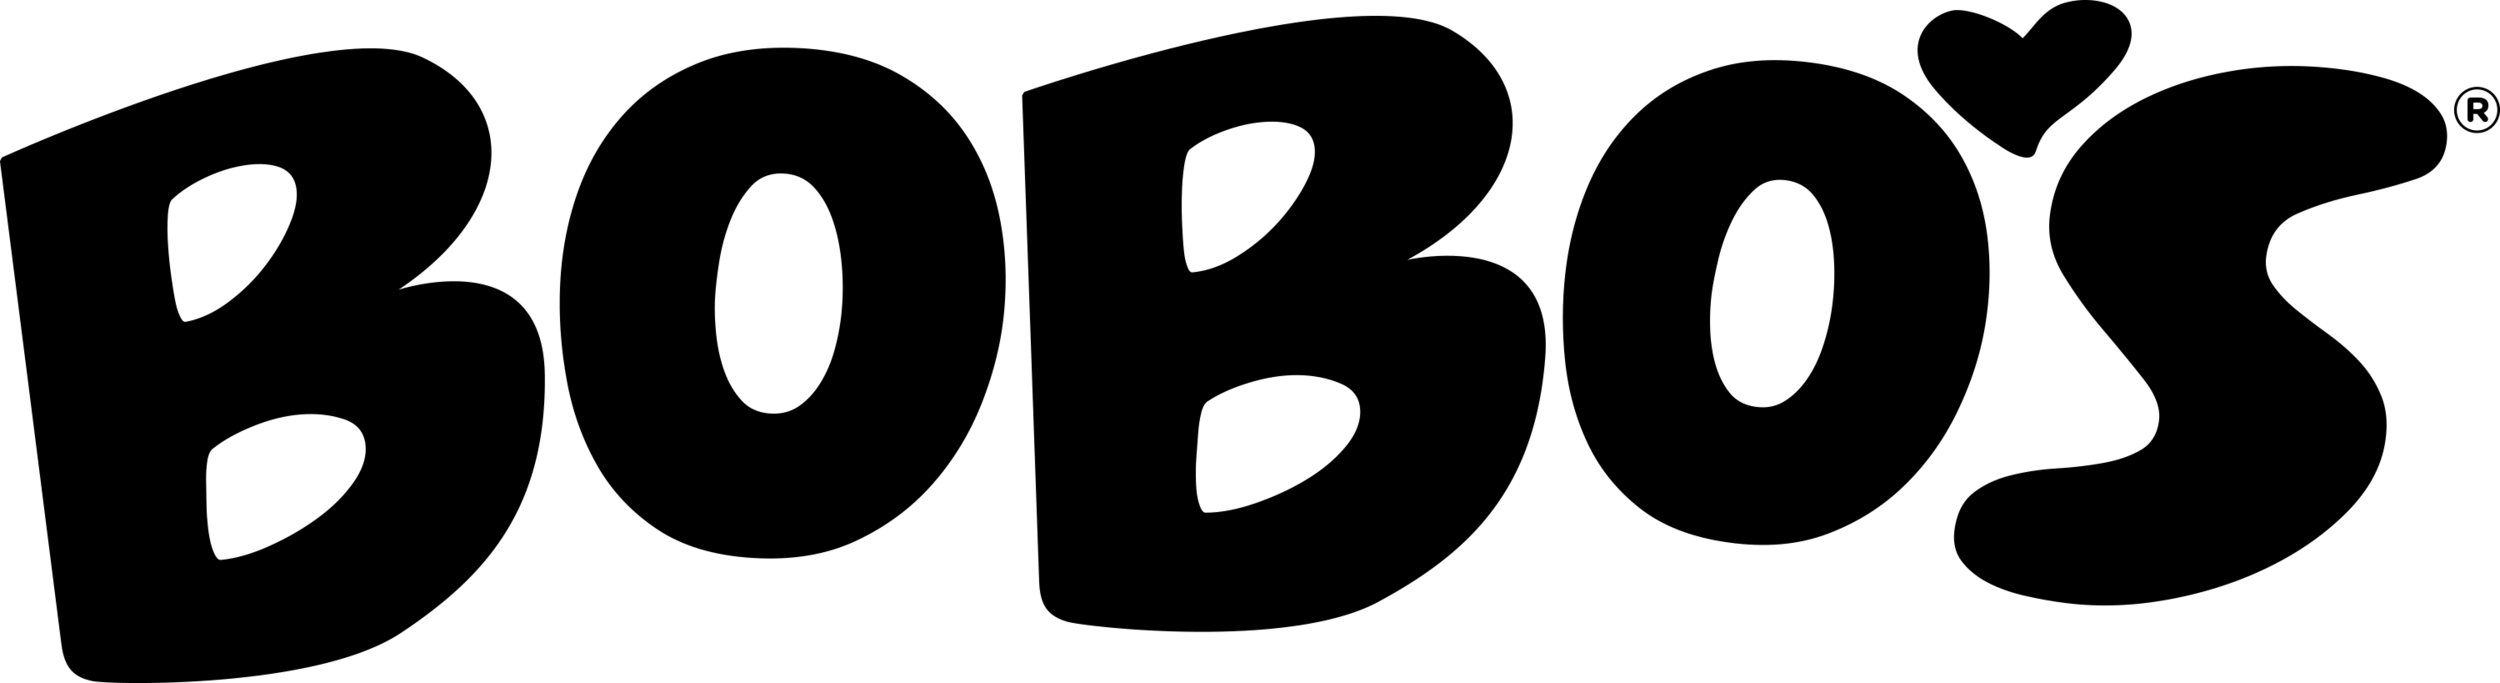 7fbfb1dafc3c-Bobos_Logo_2016_Wordmark_01.png